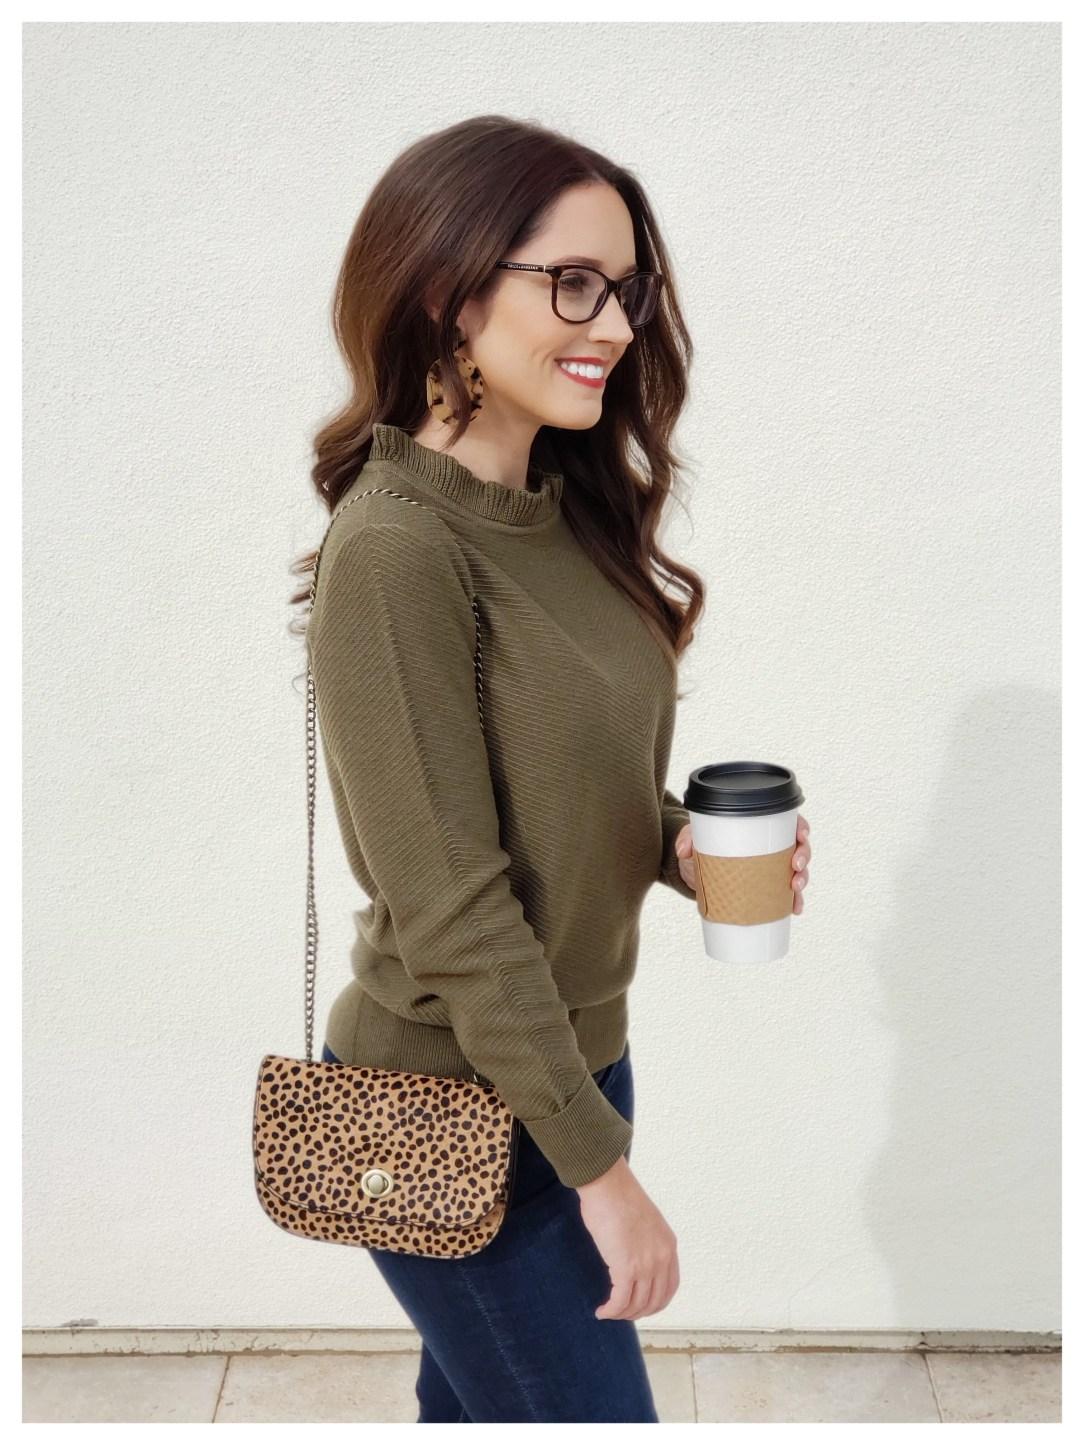 Petite Fashion Blogger Five Foot Feminine in JCREW Ruffle neck sweater